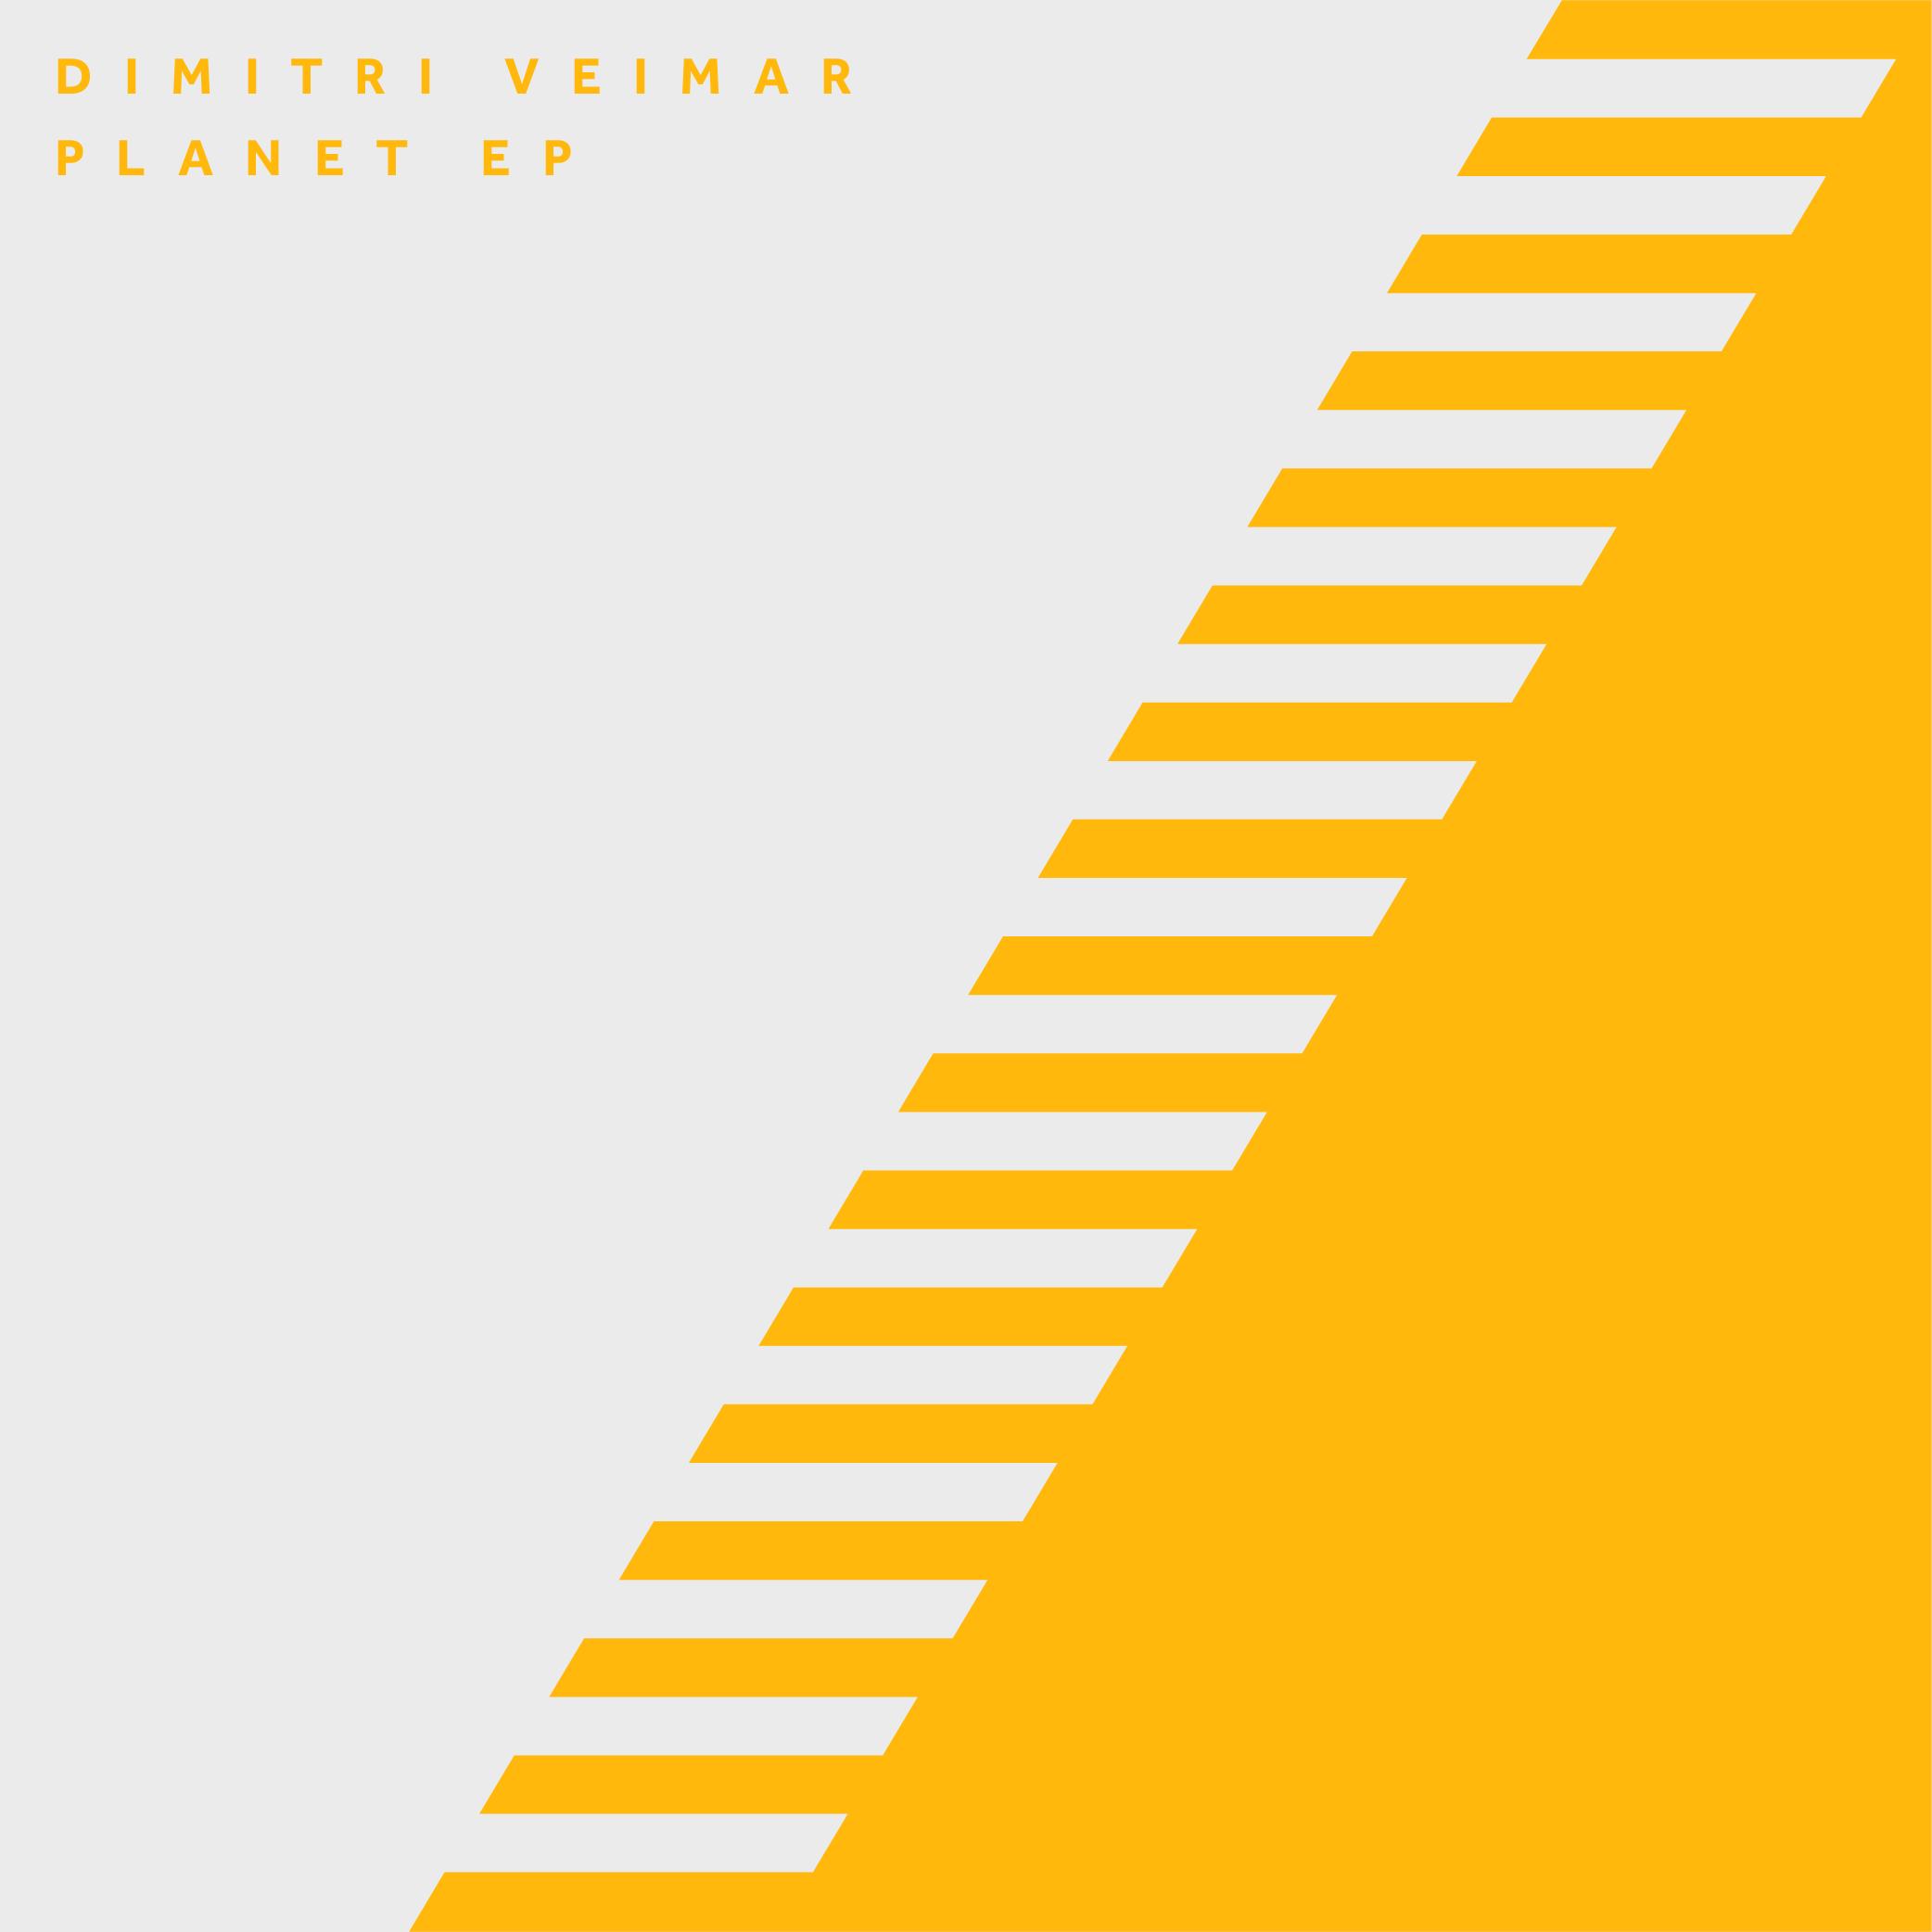 DIMITRI VEIMAR – PLANET EP